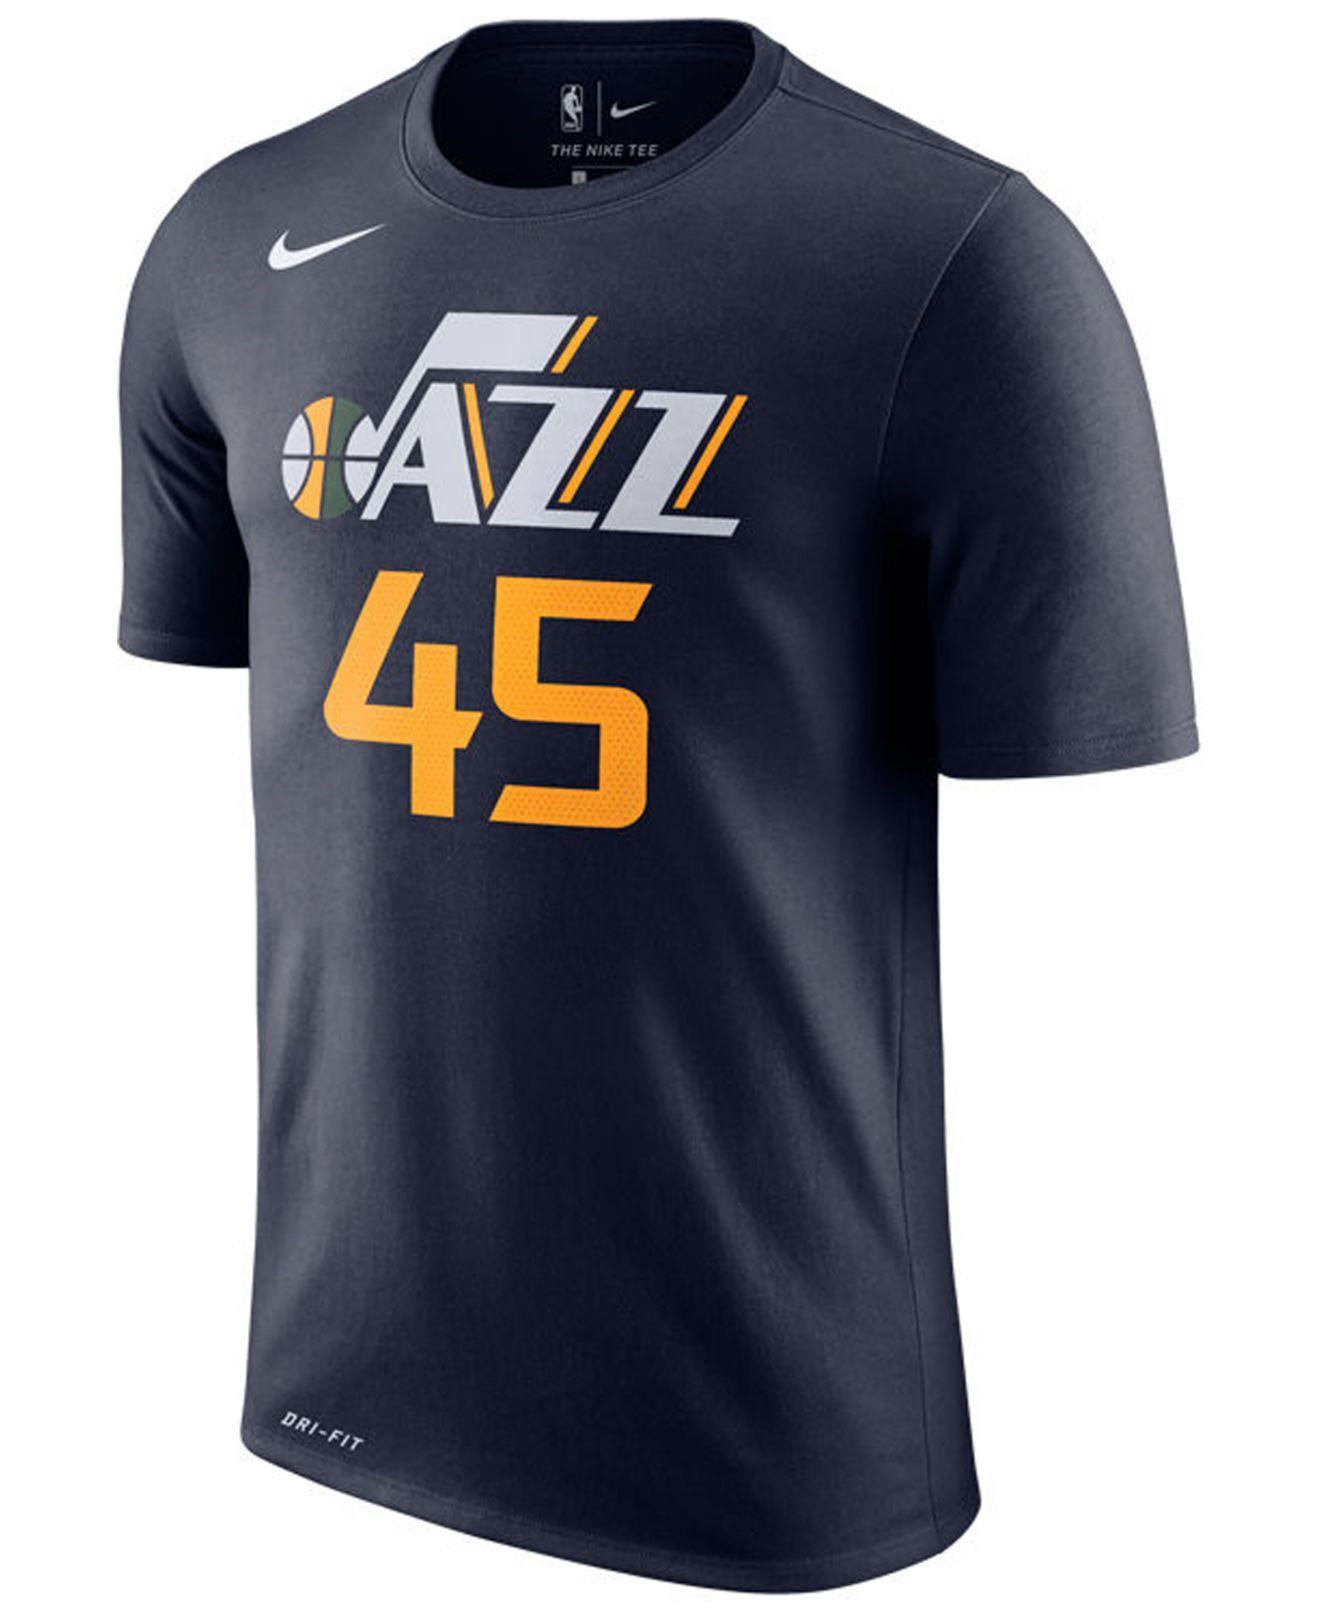 81e58c902 Lyst - Nike Donovan Mitchell Utah Jazz Icon Player T-shirt in Blue for Men